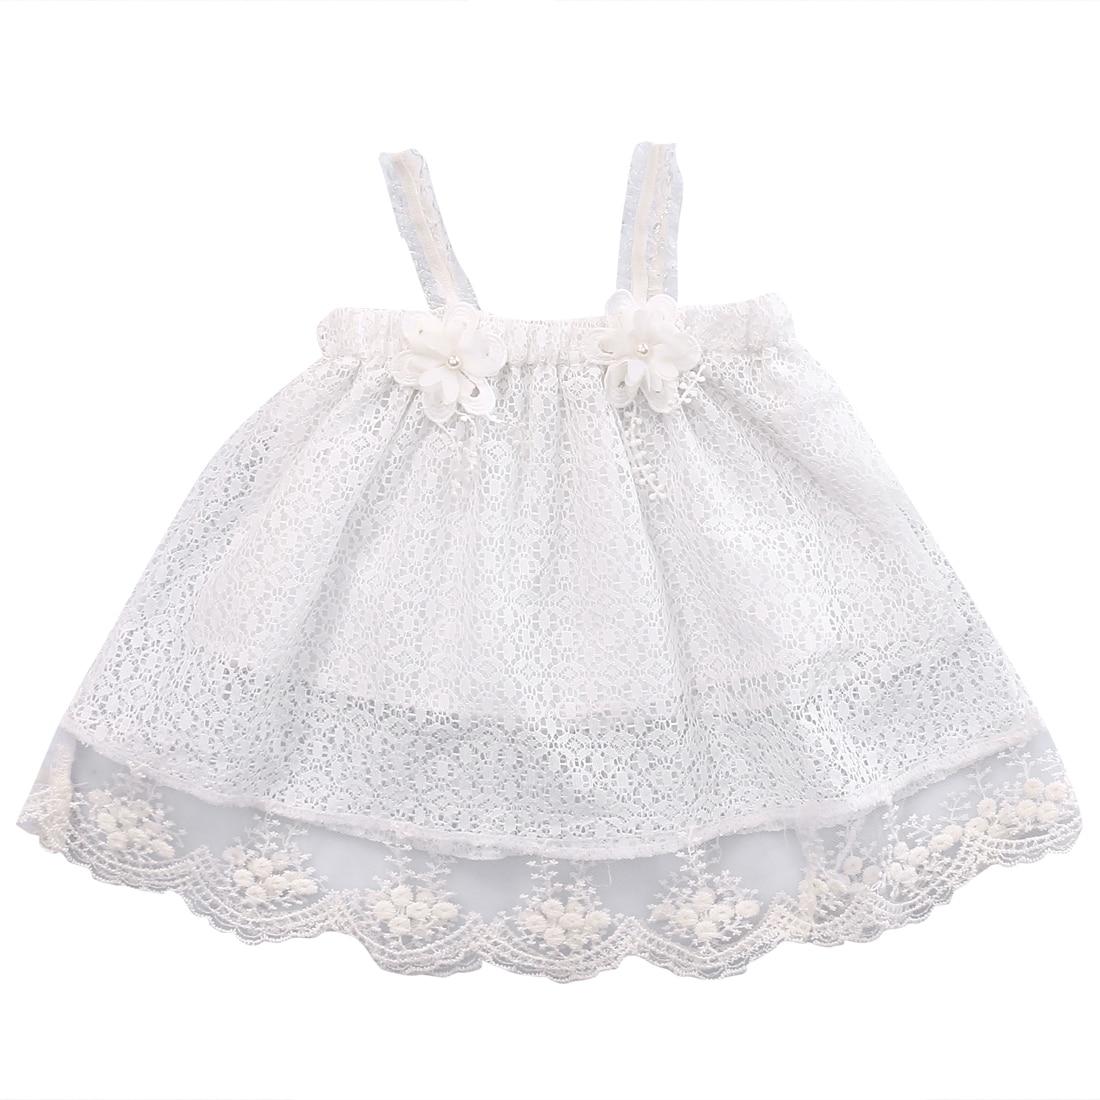 Infant Kids Baby Girls Princess Lace Dress Party Dress Sleeveless braces Tutu Flower Dresses 0-24M